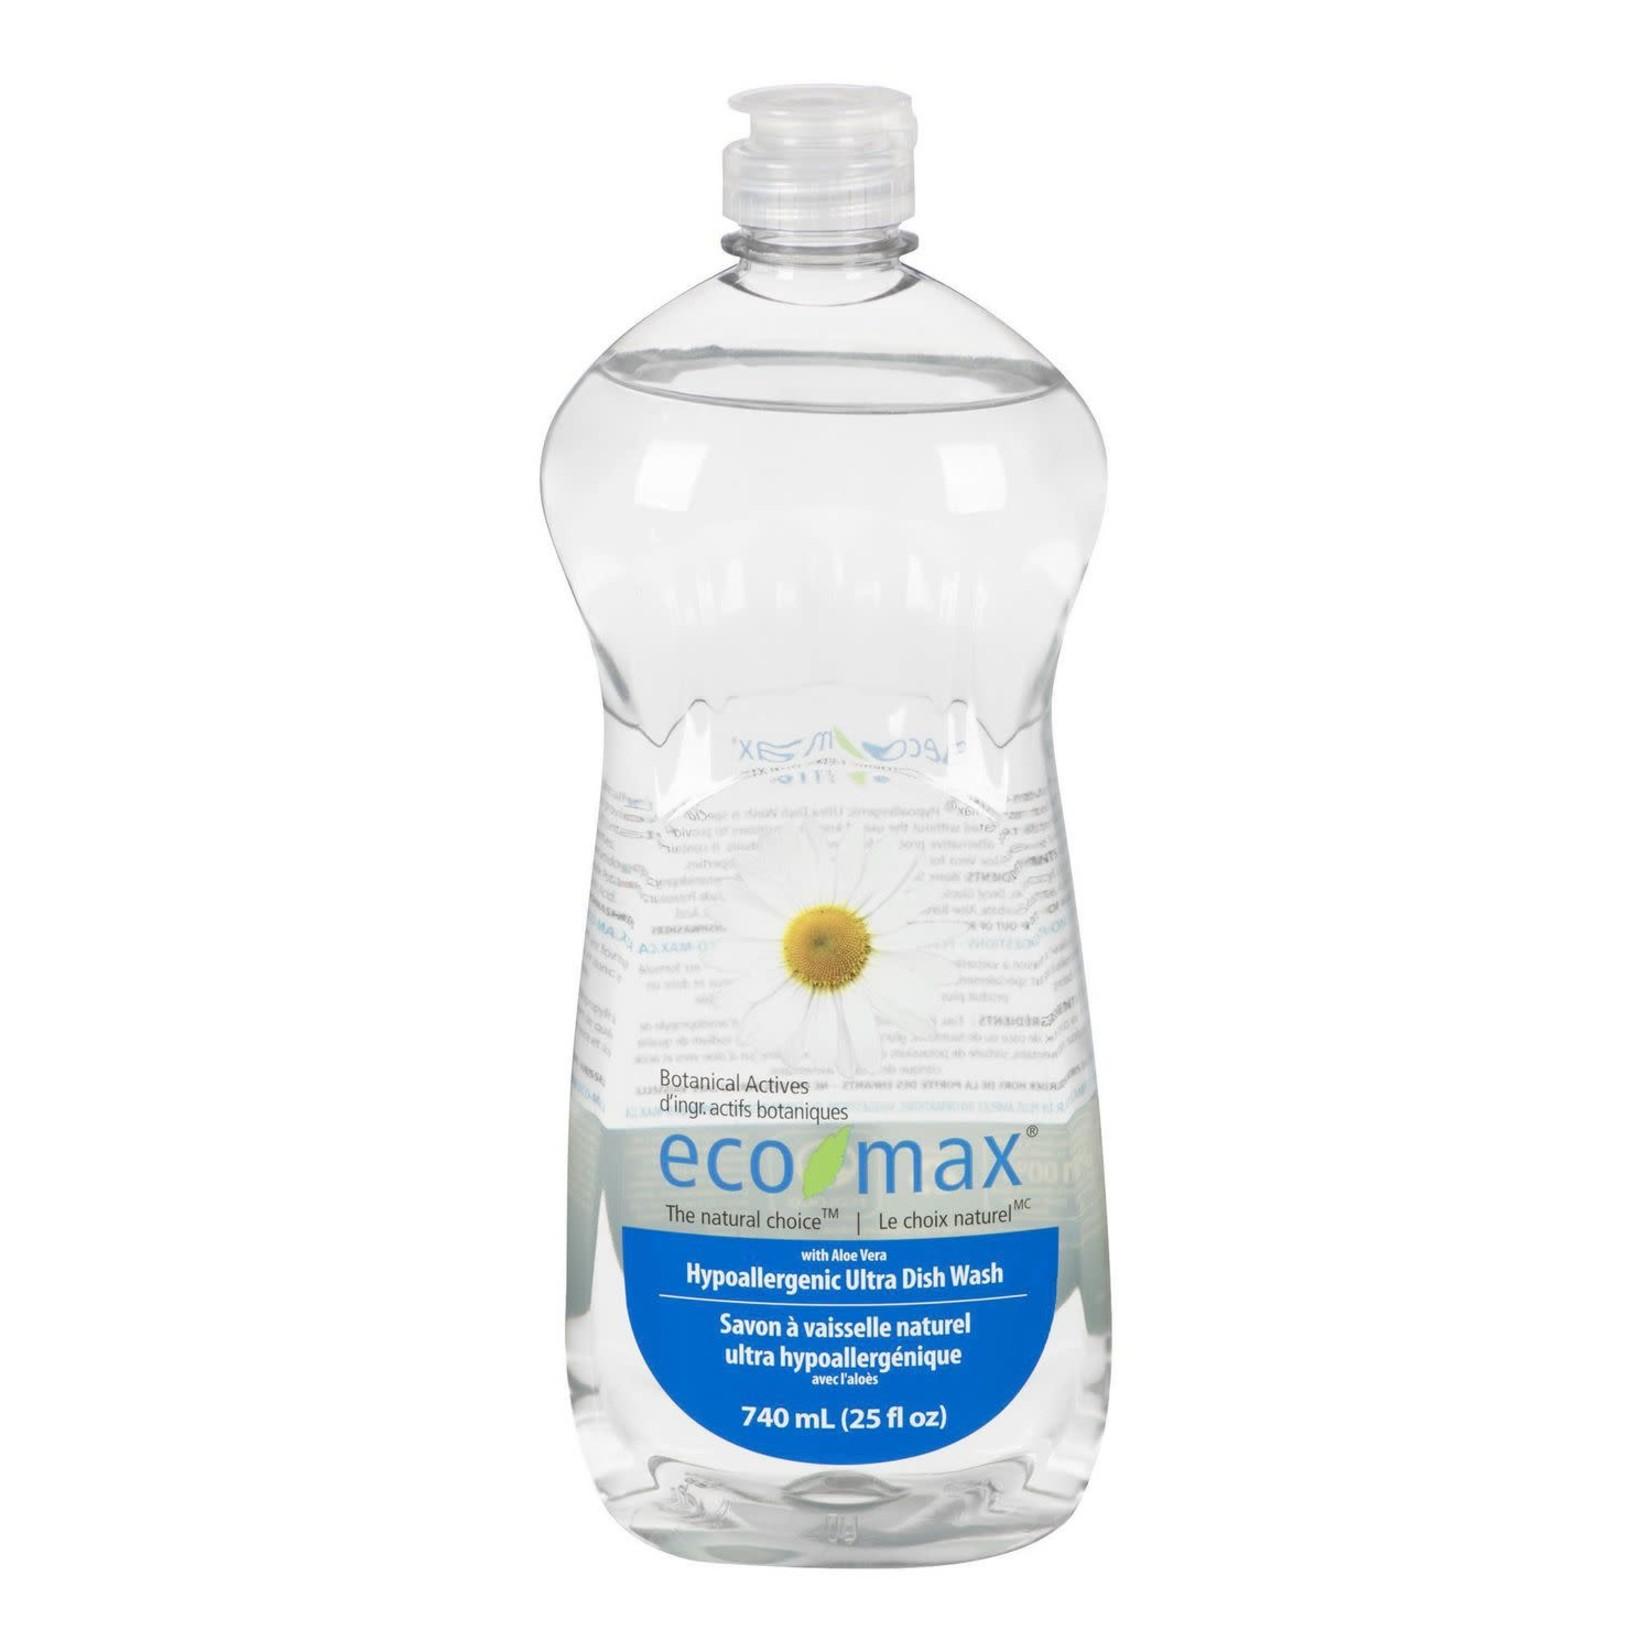 Eco-Max Eco-Max Hypoallergenic Dish Wash 740ml